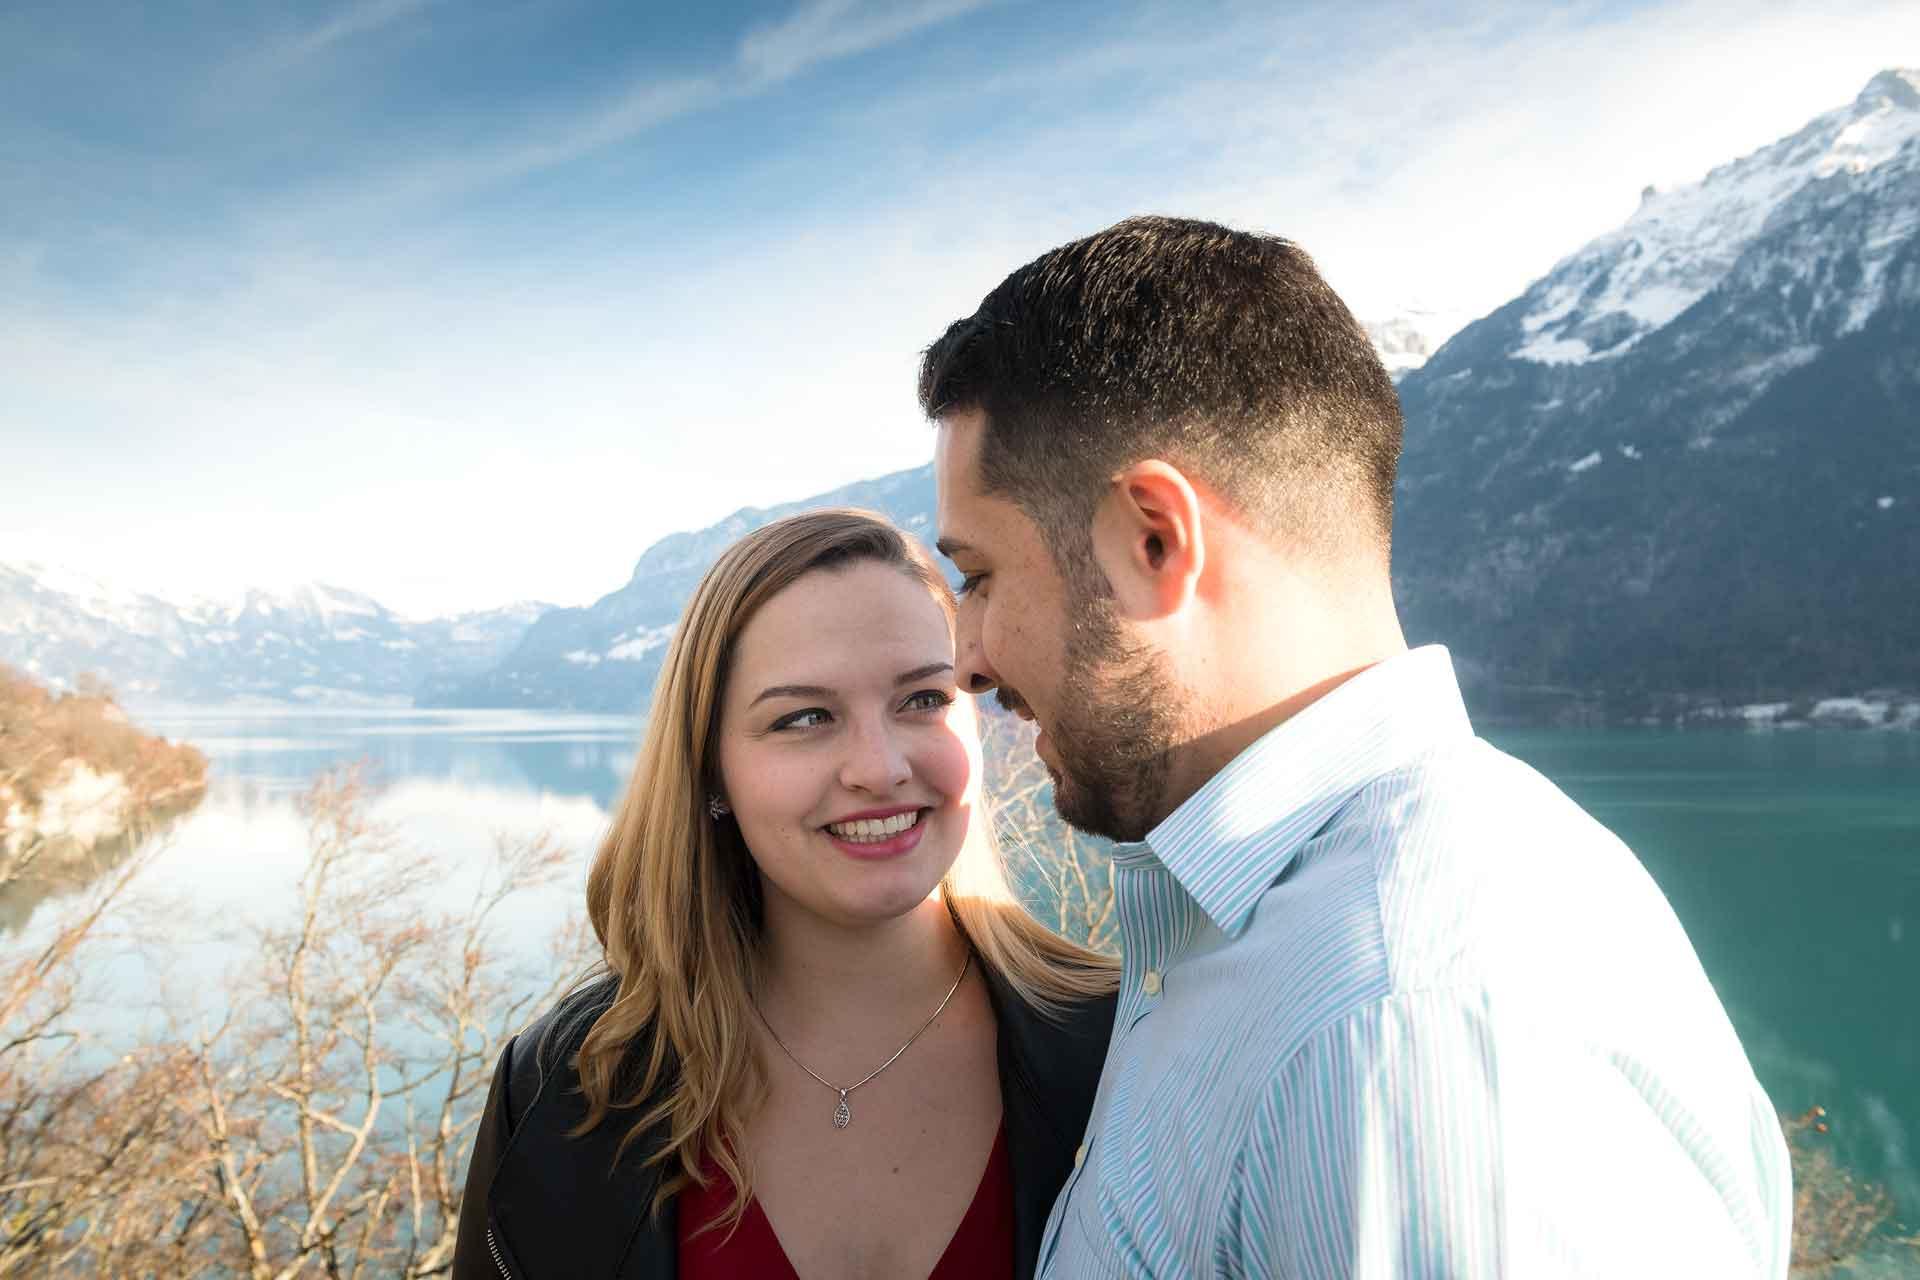 Surprise engagement near Interlaken